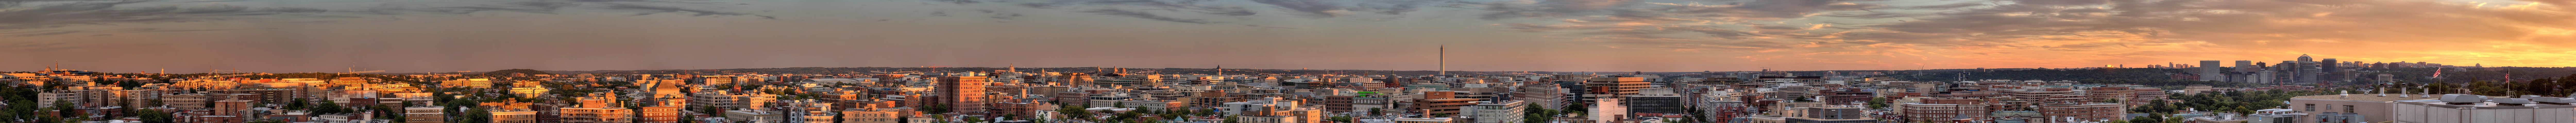 panorama day view